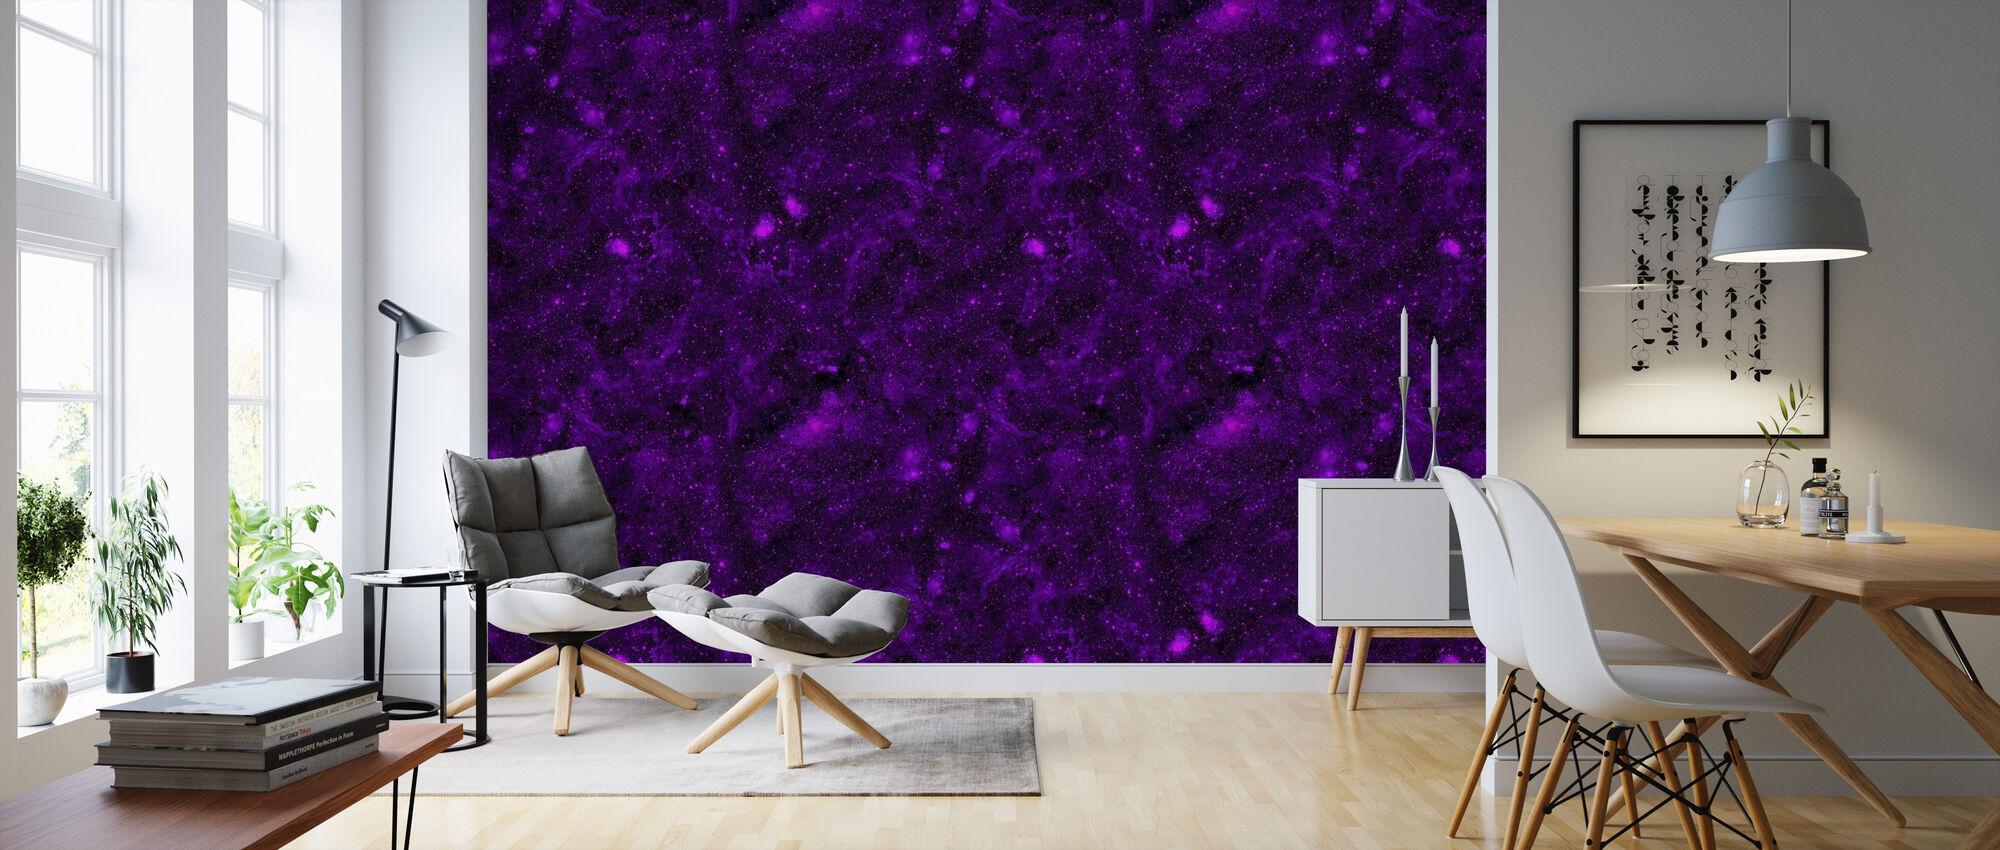 Dragoon - Wallpaper - Living Room